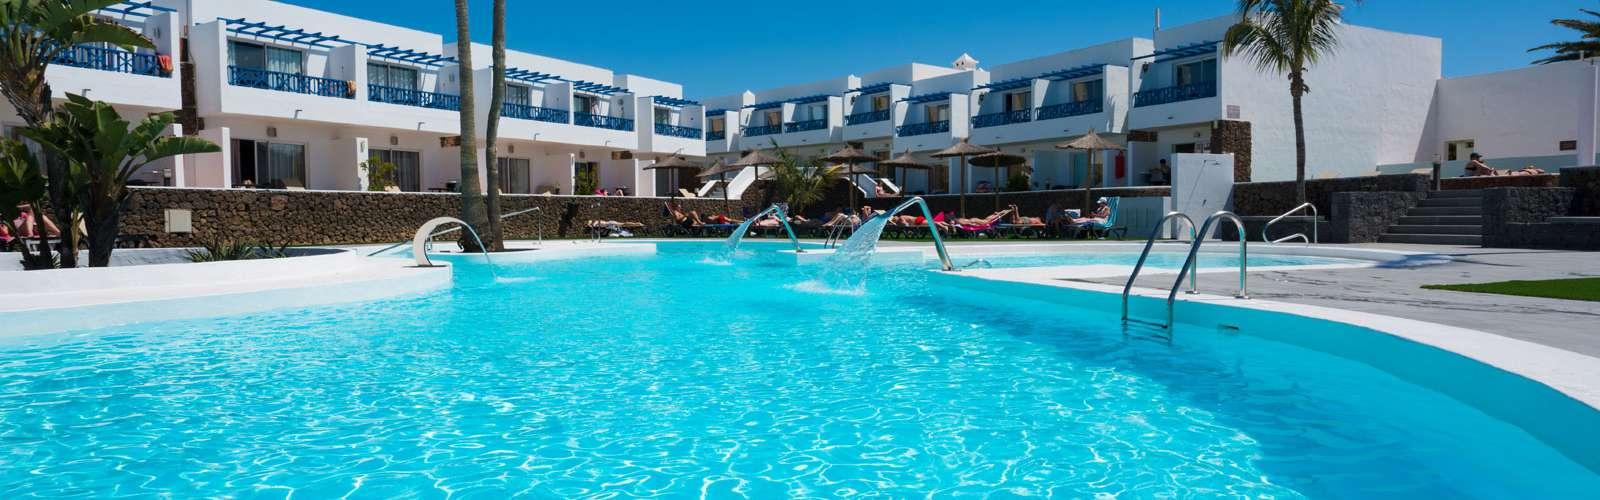 Lanzarote All Inclusive | Club Siroco Apartments